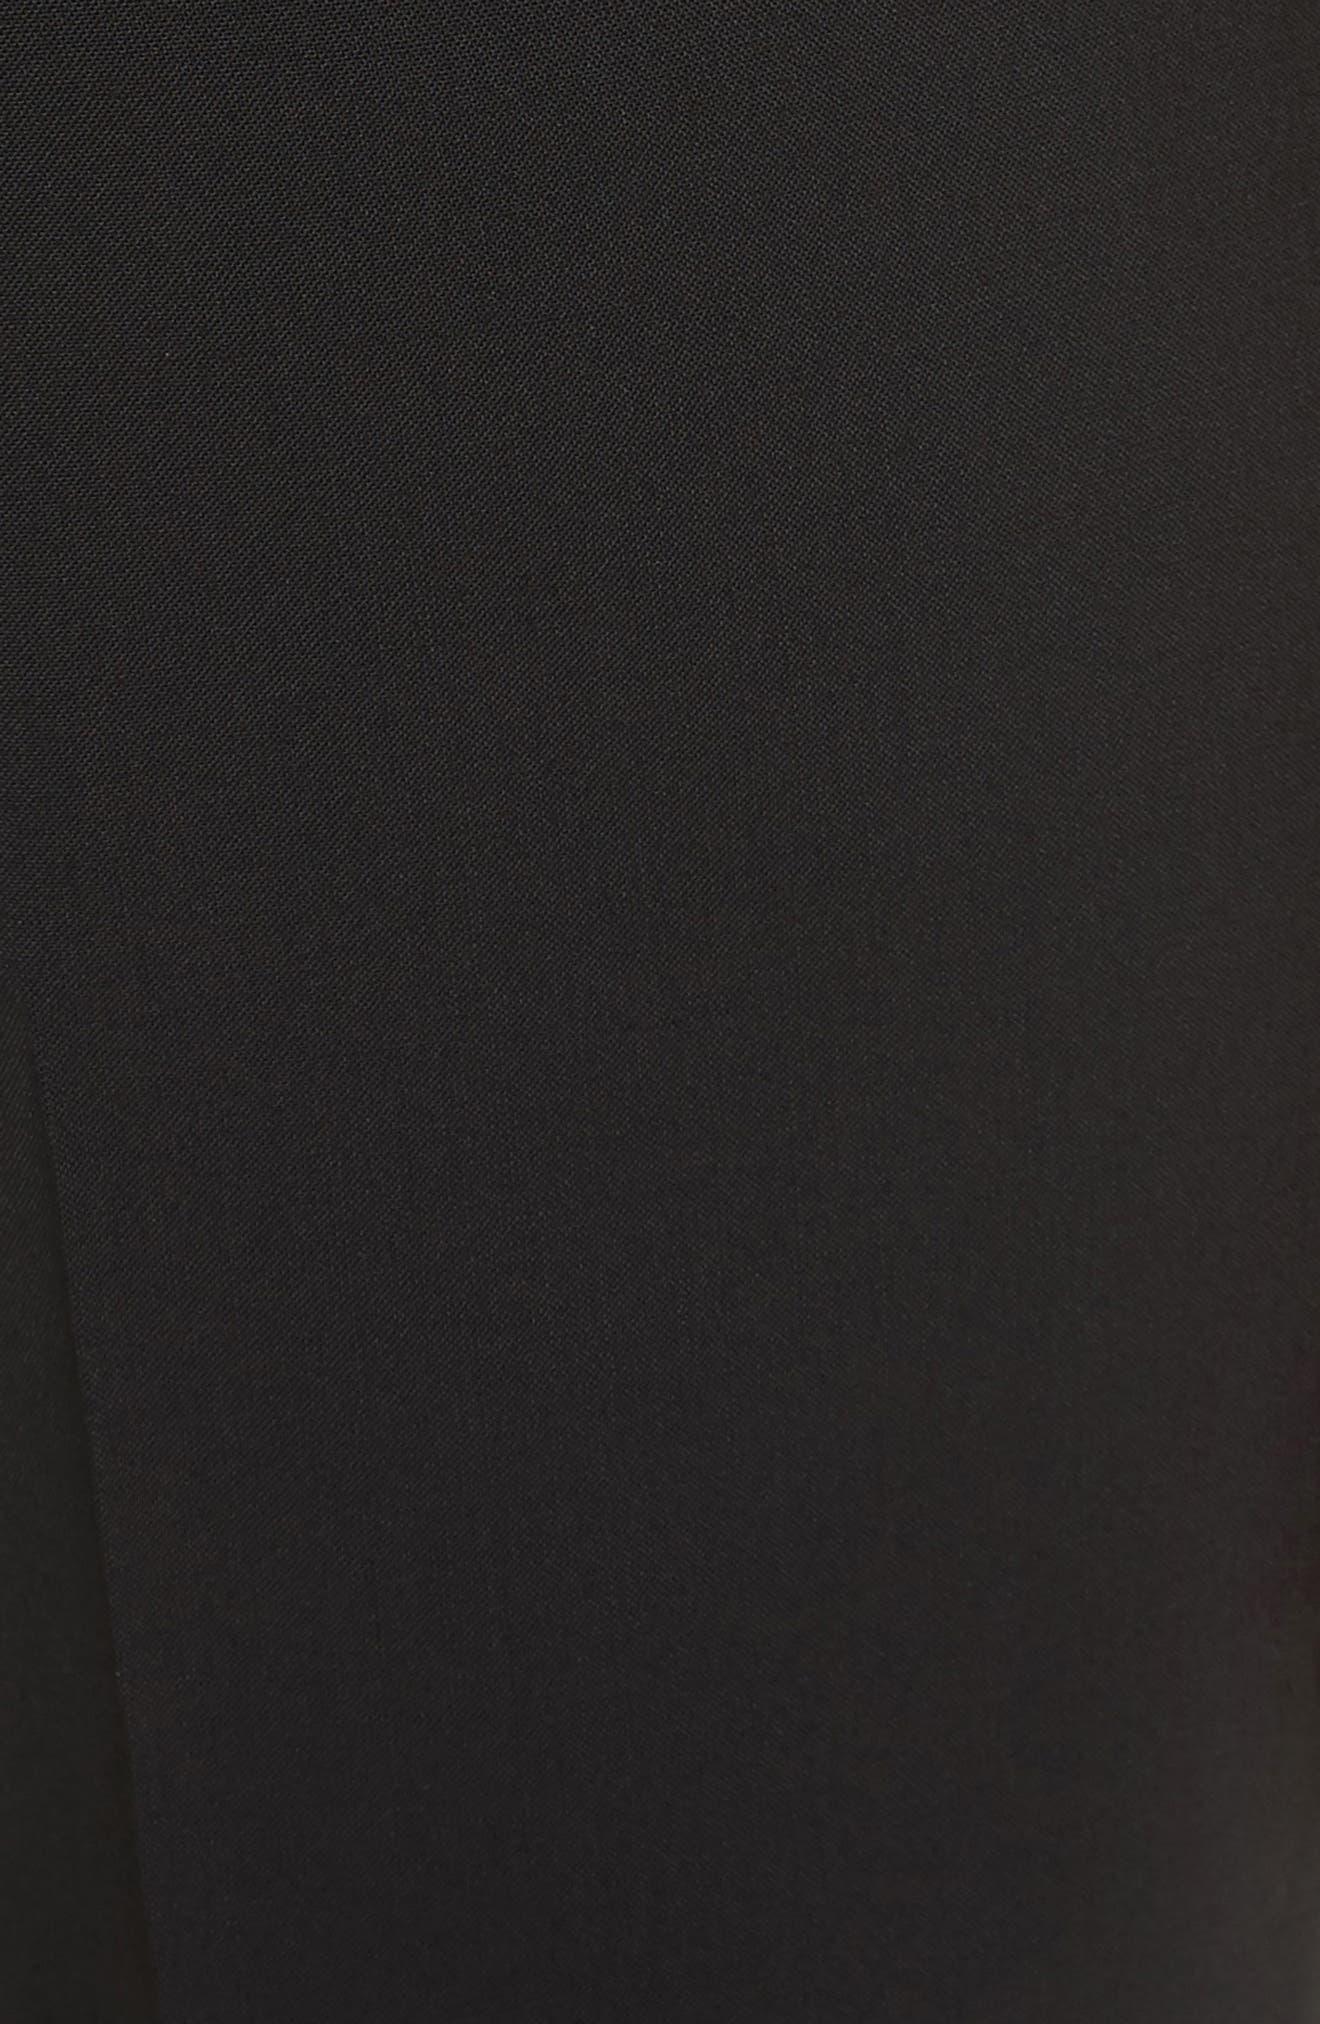 THEORY, Treeca 2 Good Wool Crop Suit Pants, Alternate thumbnail 6, color, BLACK